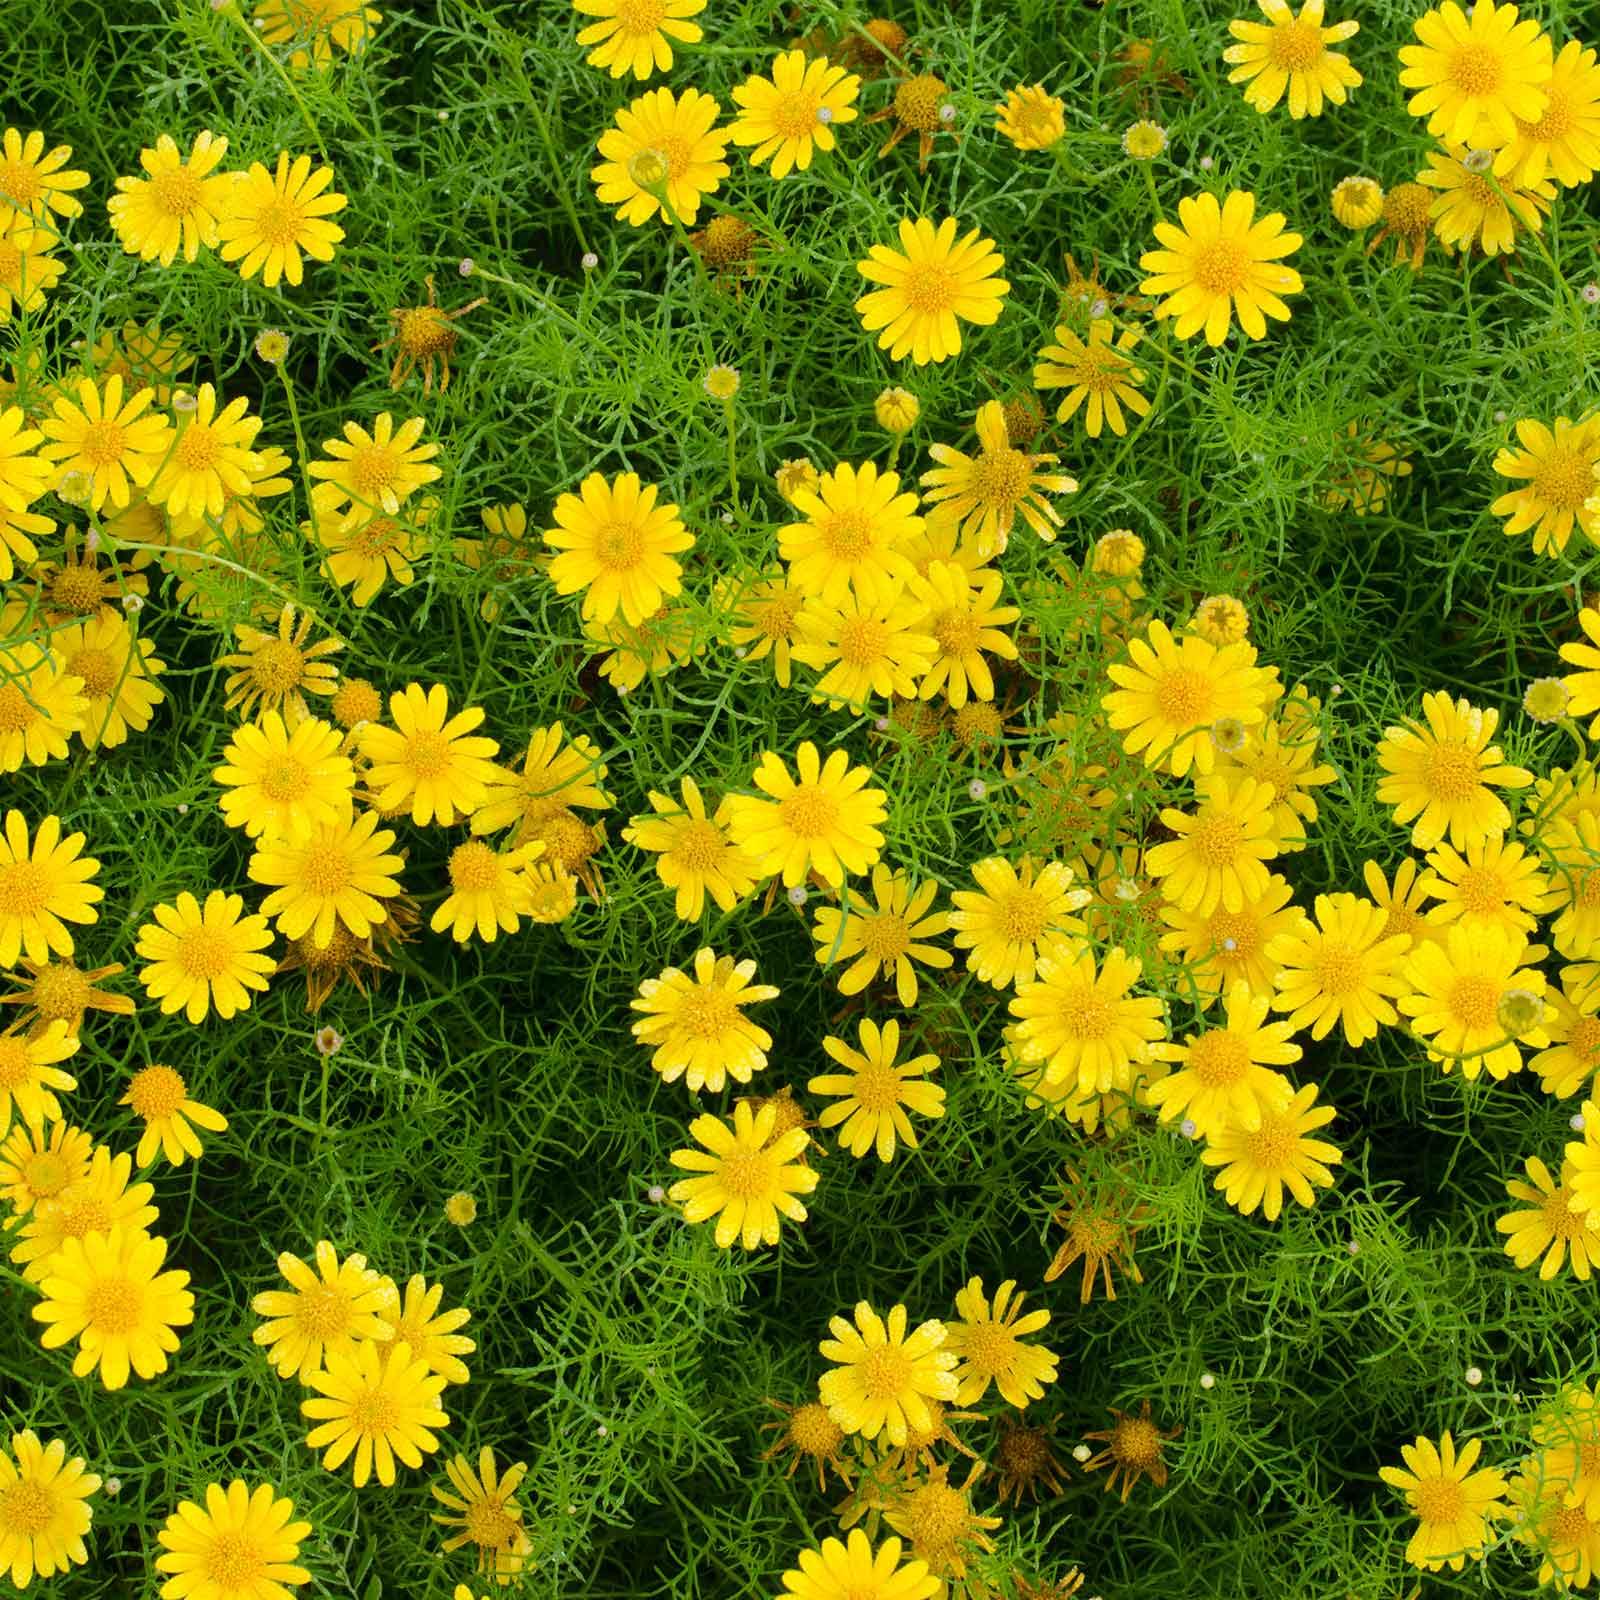 Golden Fleece Dahlberg Daisy Flower Seeds 1000 Seeds Annual